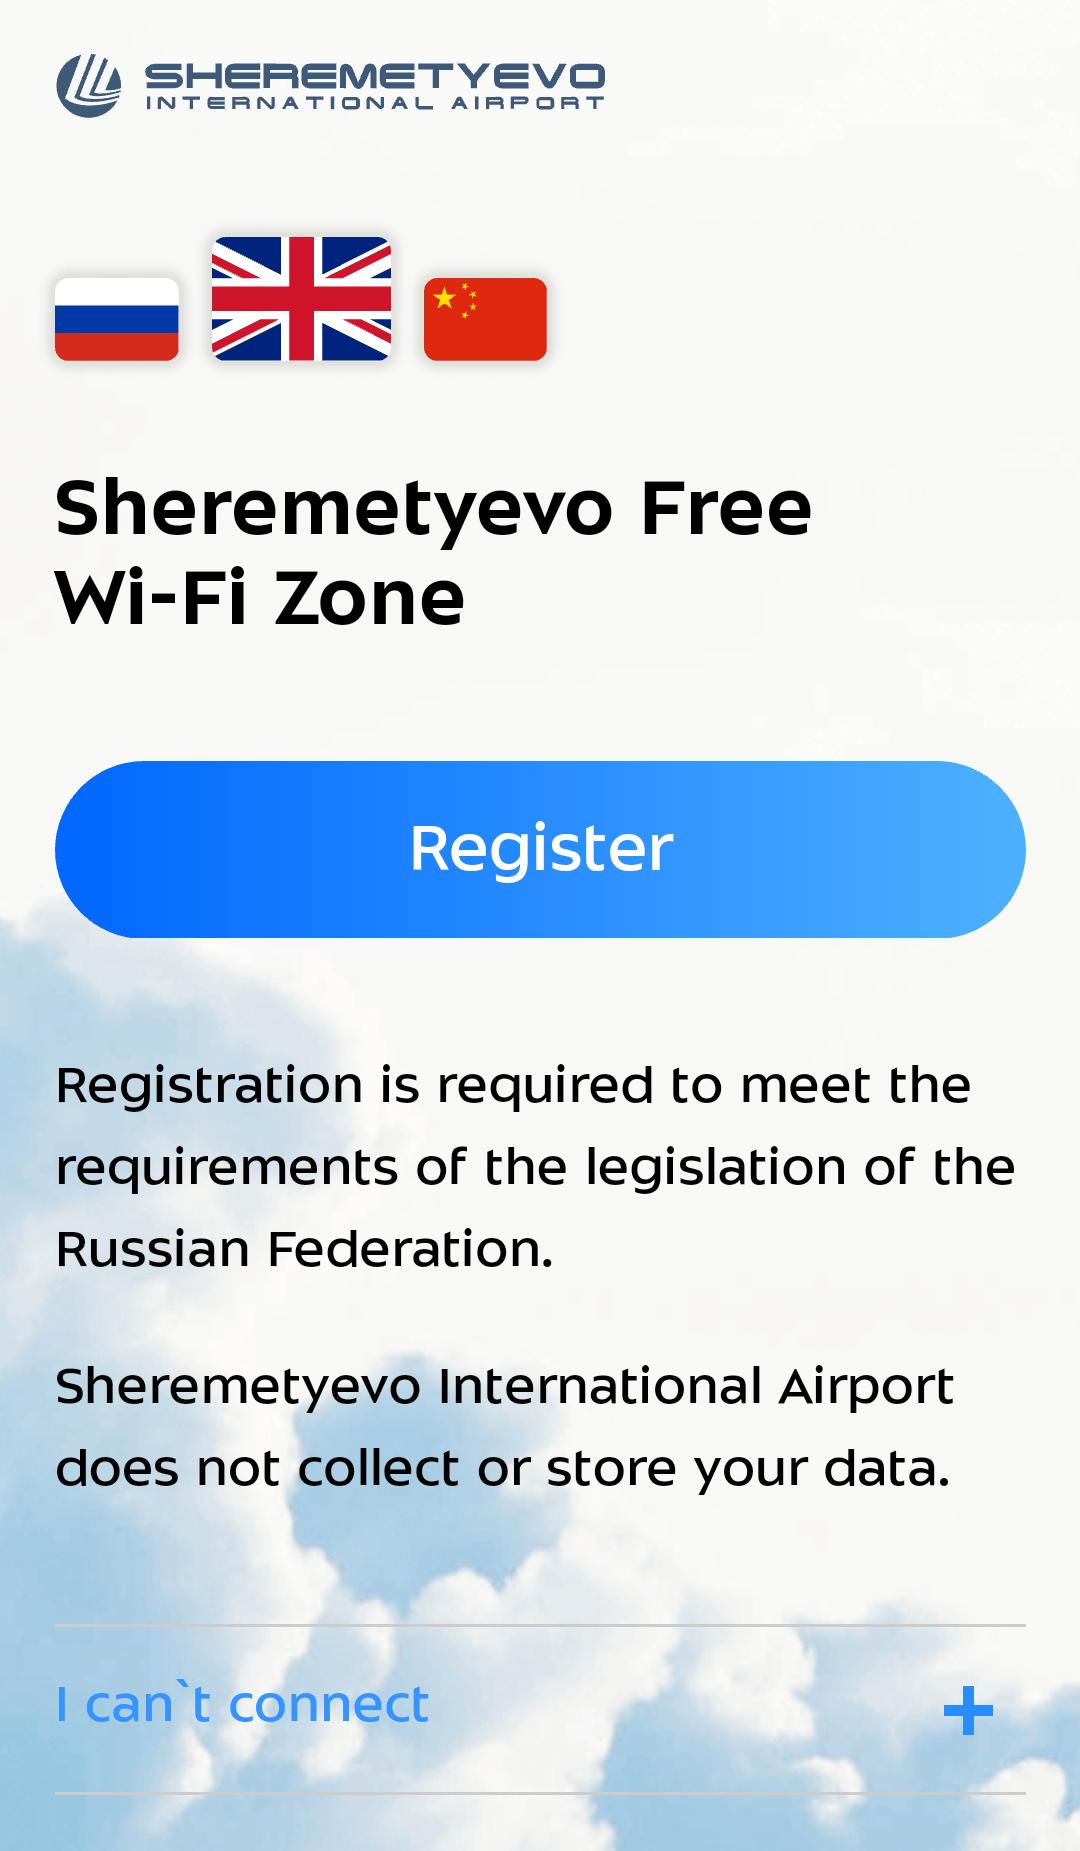 Wi-Fi / Sheremetyevo International Airport